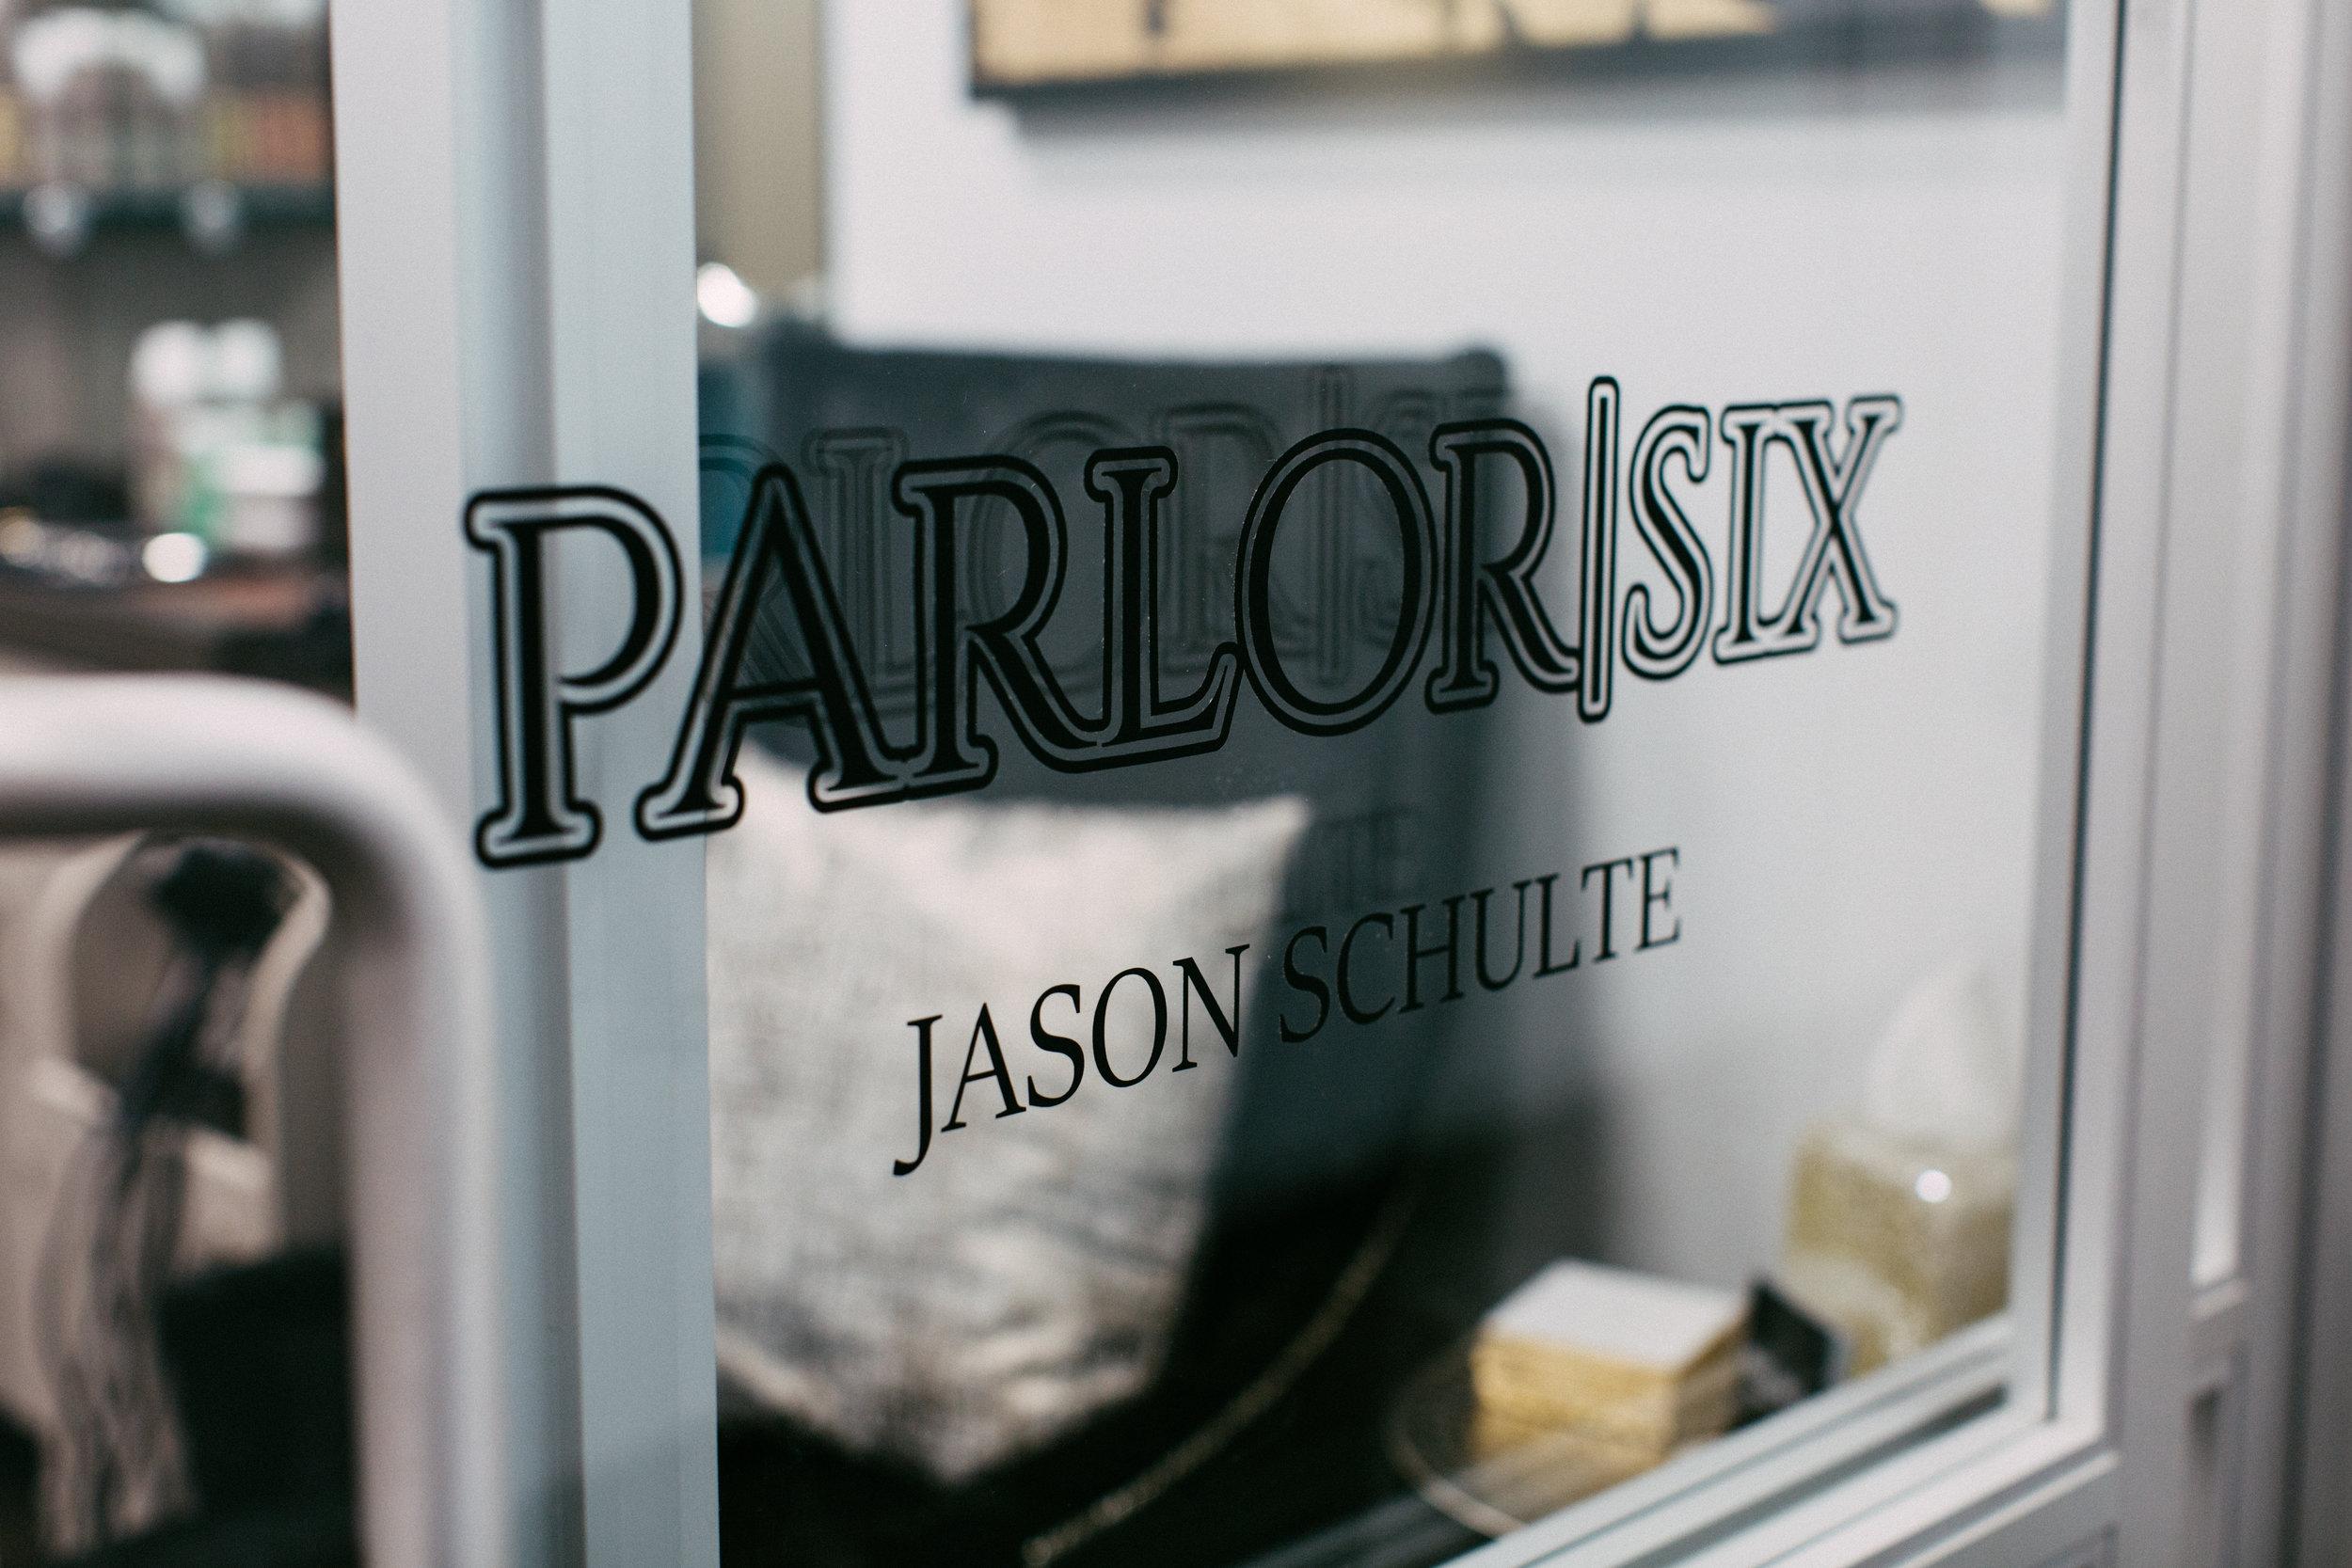 parlor six-jason schulte-pittsburgh salon-3.jpg